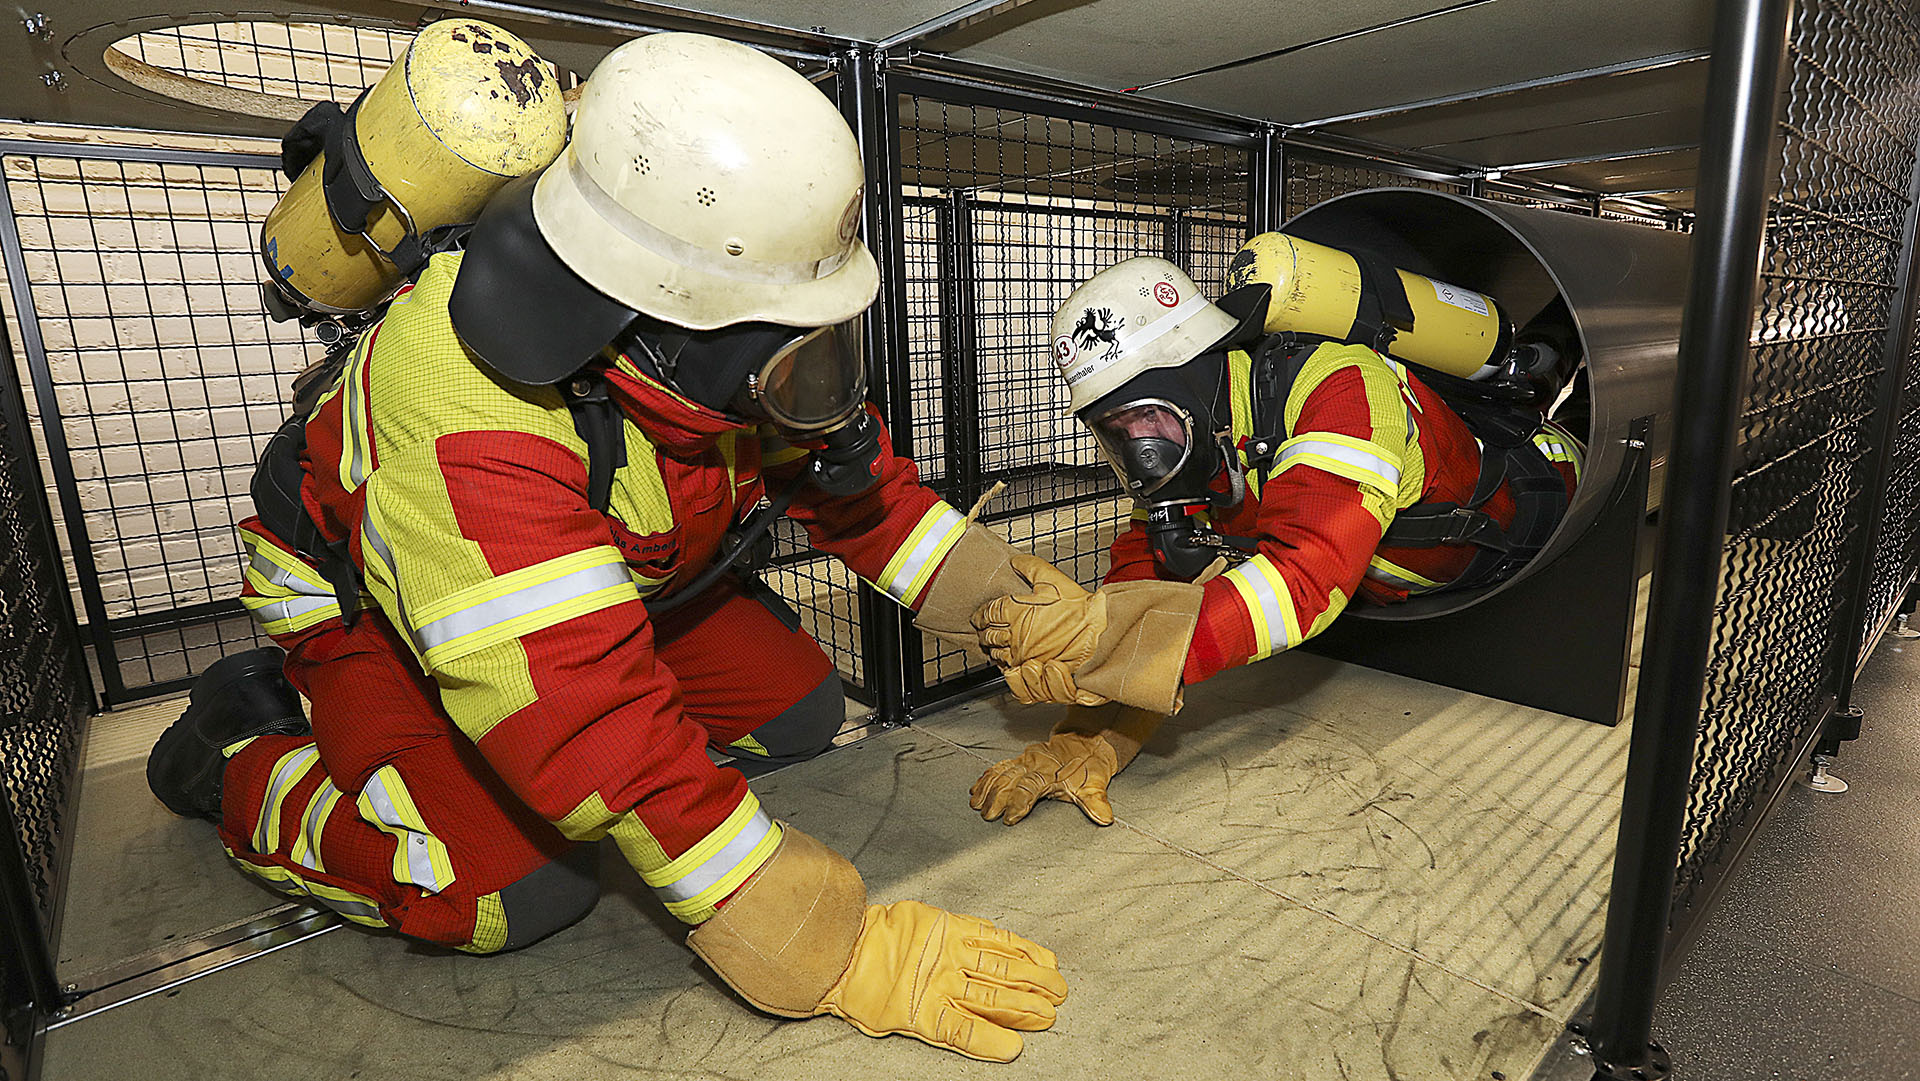 Bosch plant fire service